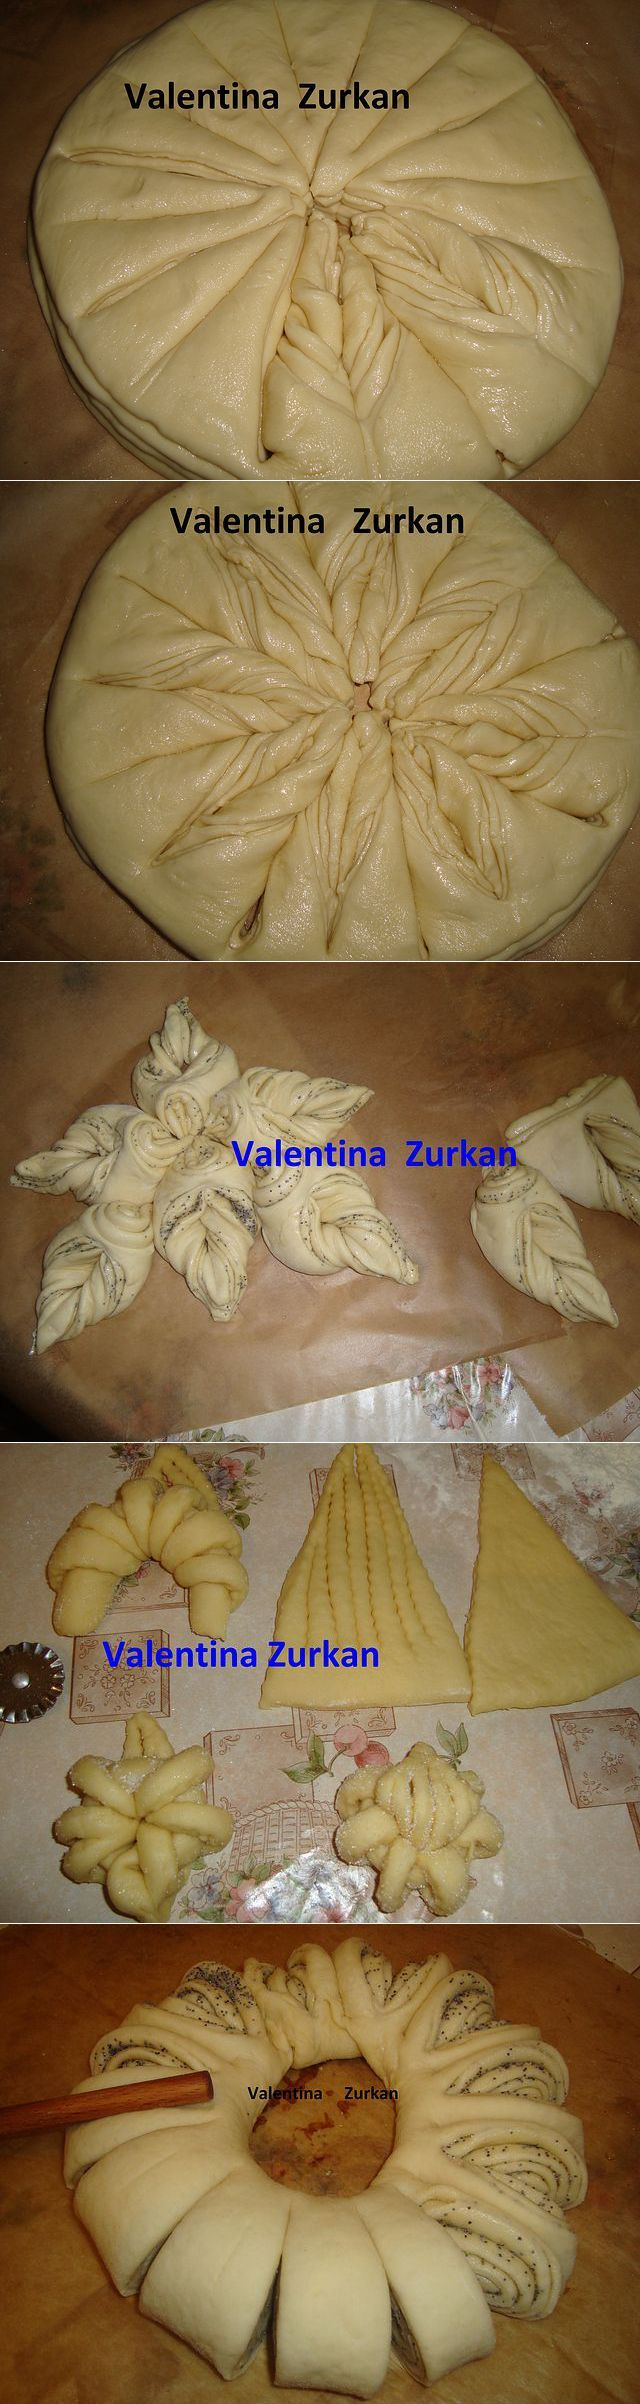 FLORES DE MANZANAS   http://postila.ru/vladimirova-67/pirogi    http://saikurecetas.blogspot.com.ar/    http...